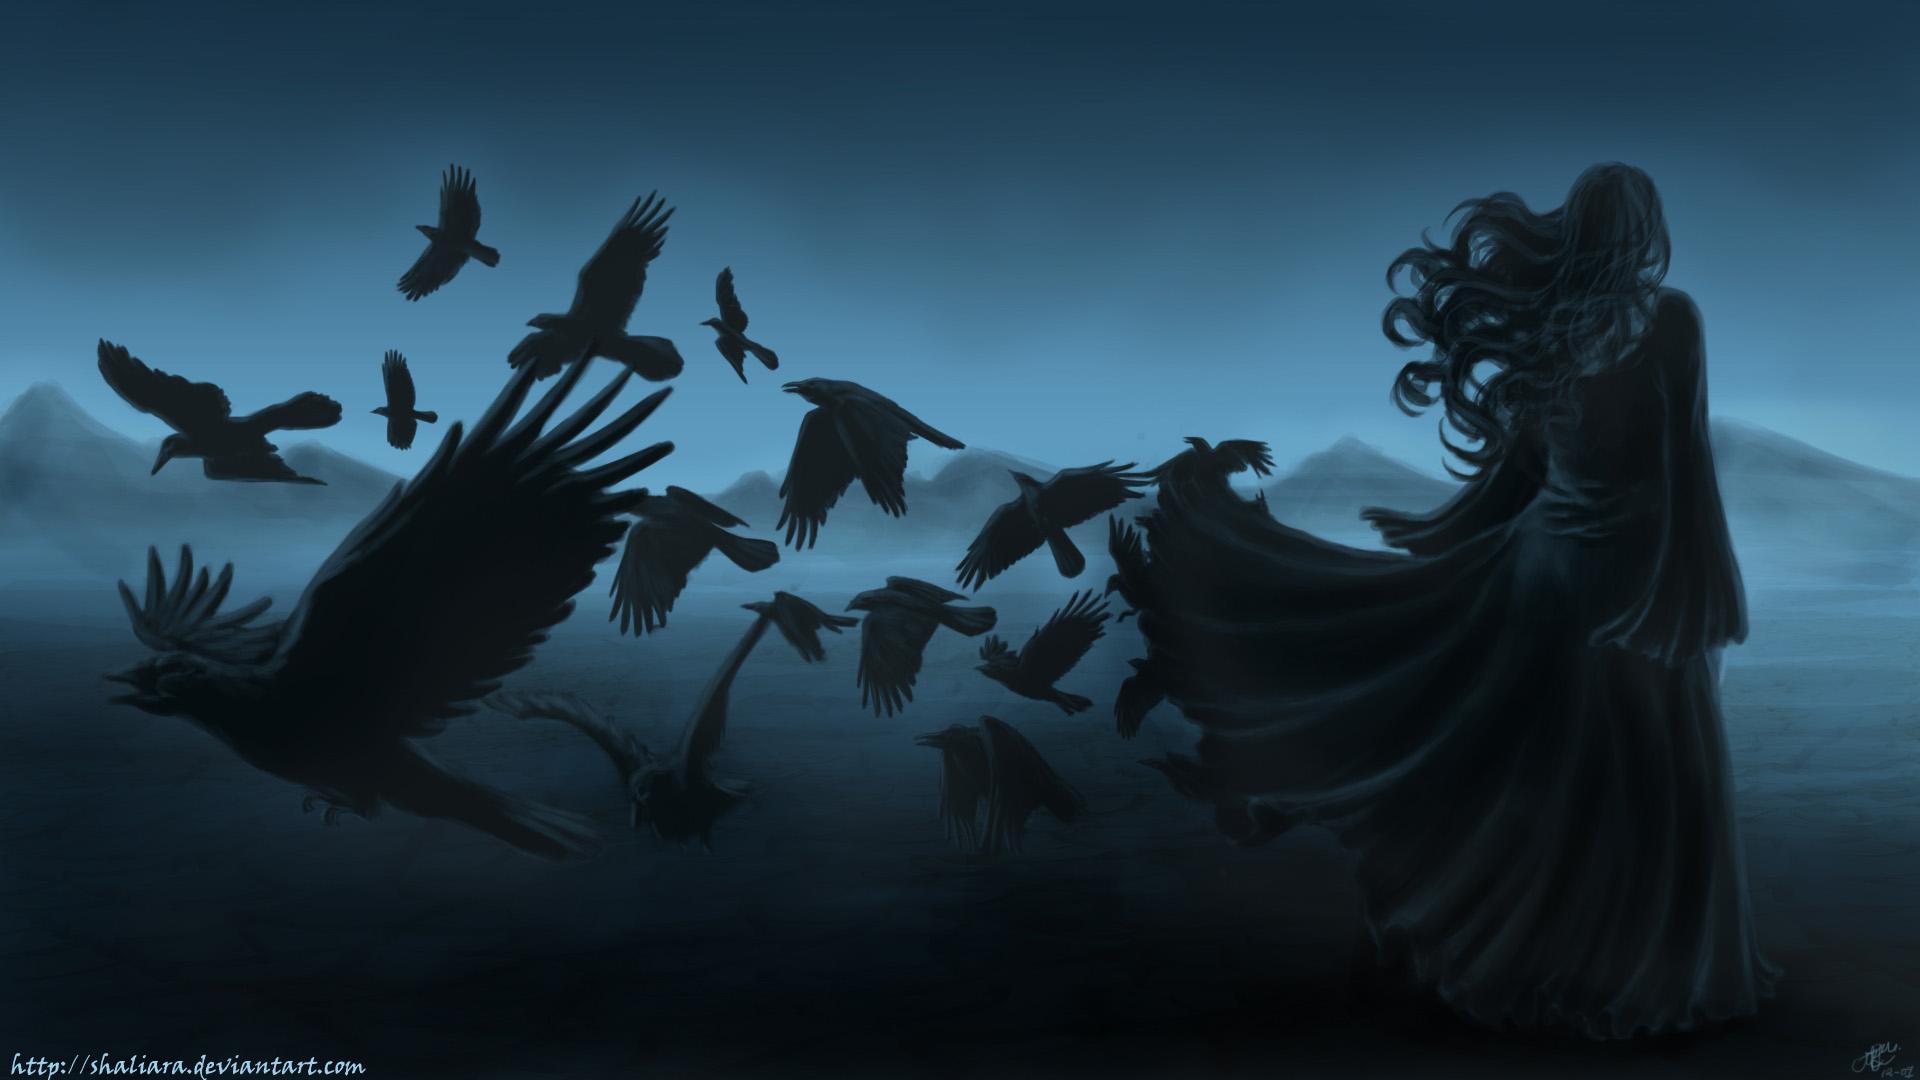 dark horror gothic women raven poe birds art mood wallpaper backgroundItachi Crows Wallpaper